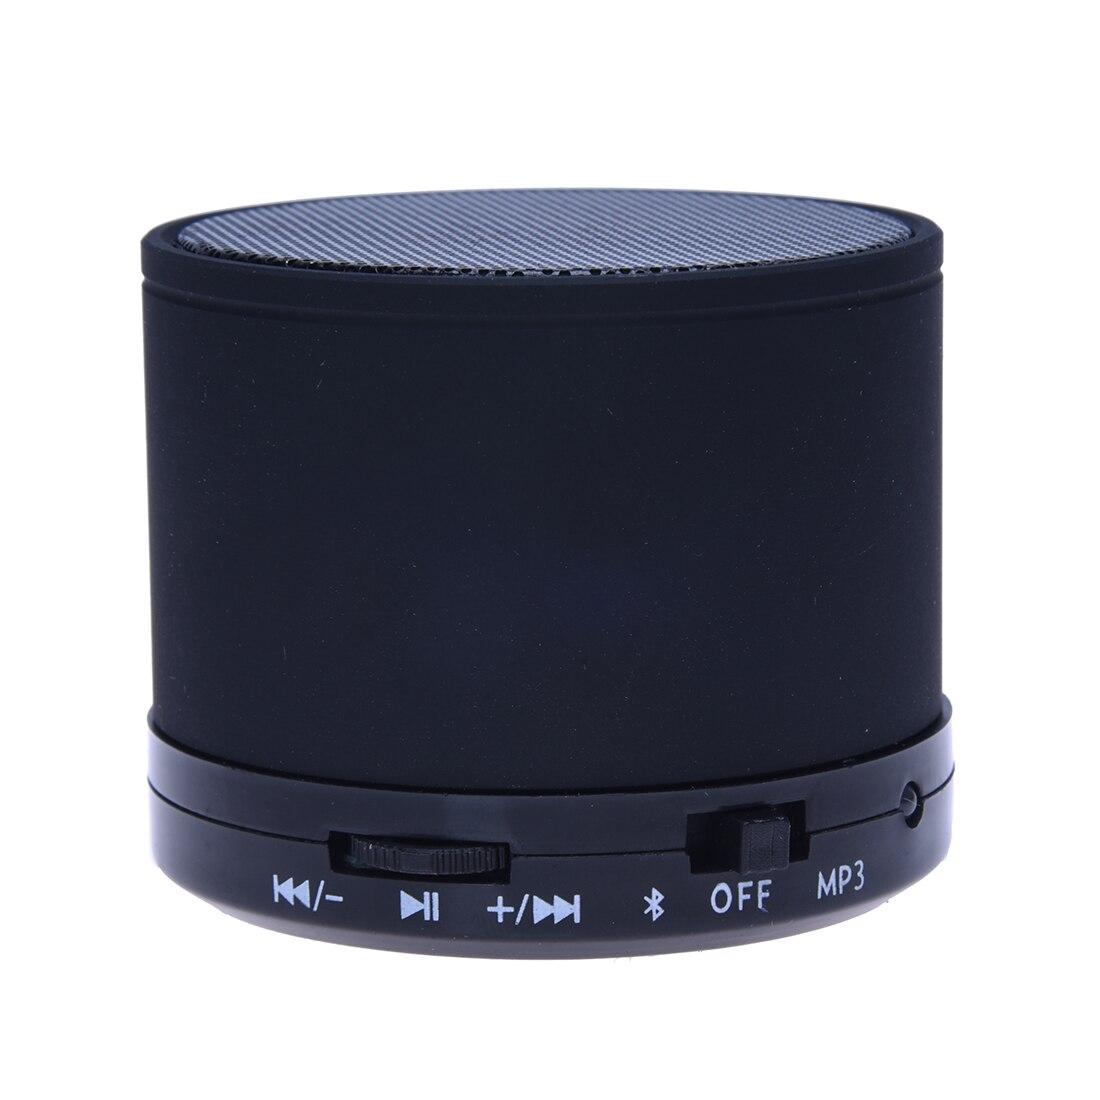 Mini <font><b>Portable</b></font> Multimedia Speaker USB Micro SD TF Card Black for iphone ipod <font><b>CD</b></font>